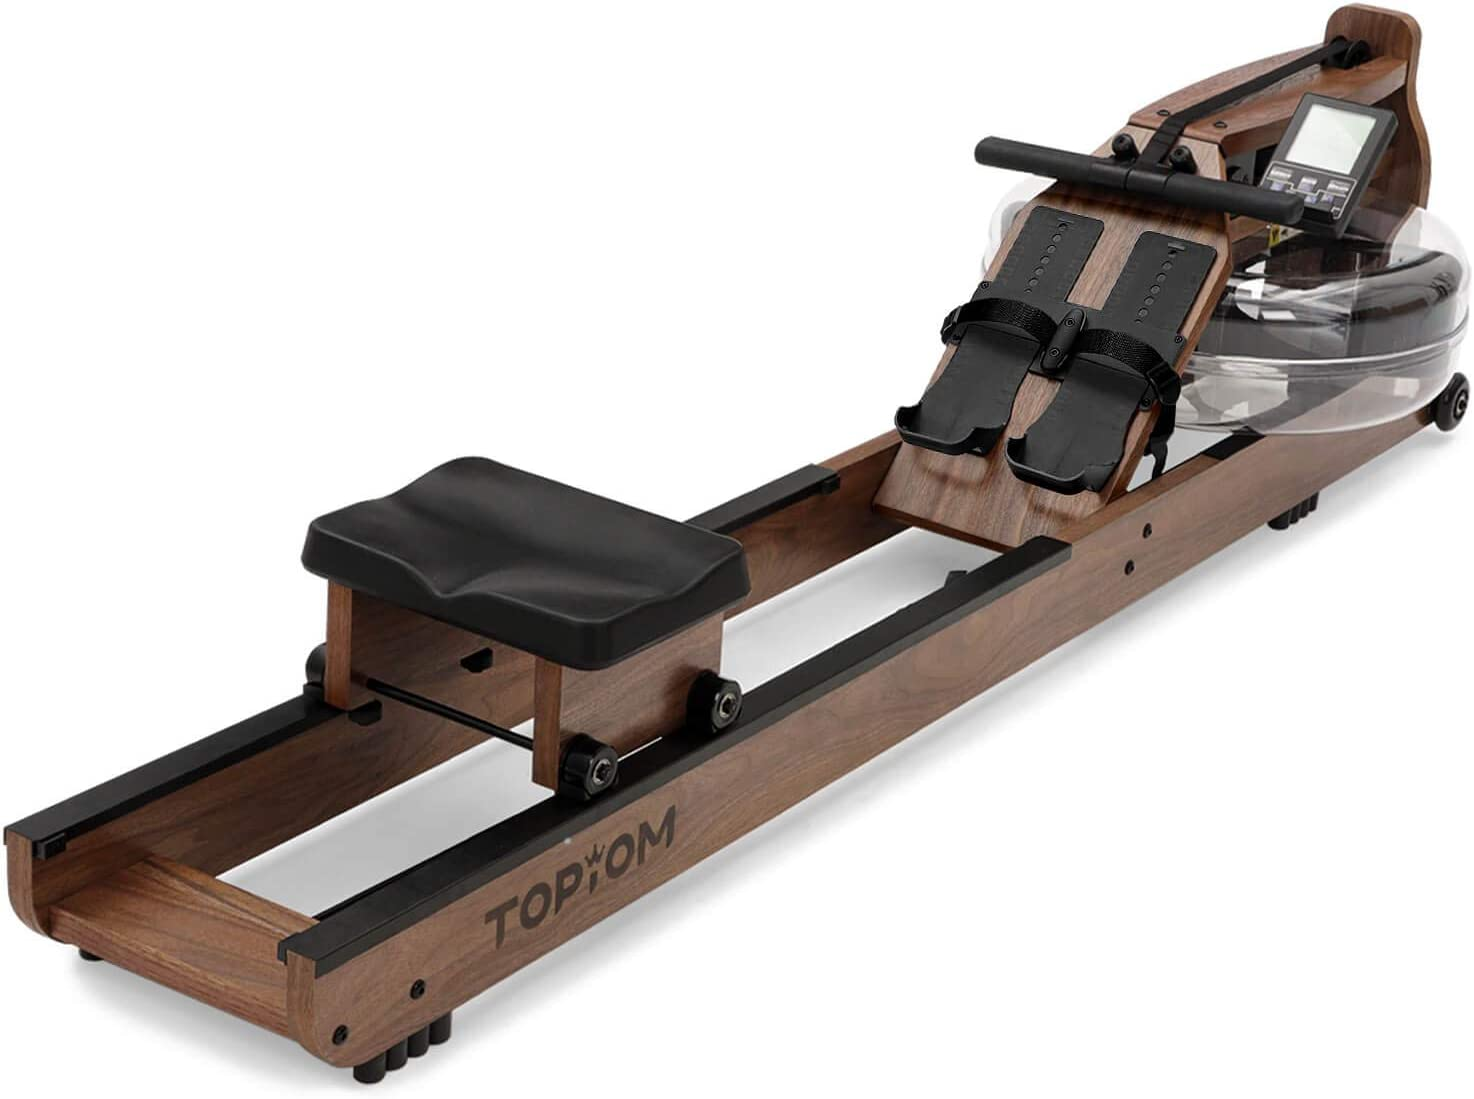 Topiom Water Rowing Machine - Full view image